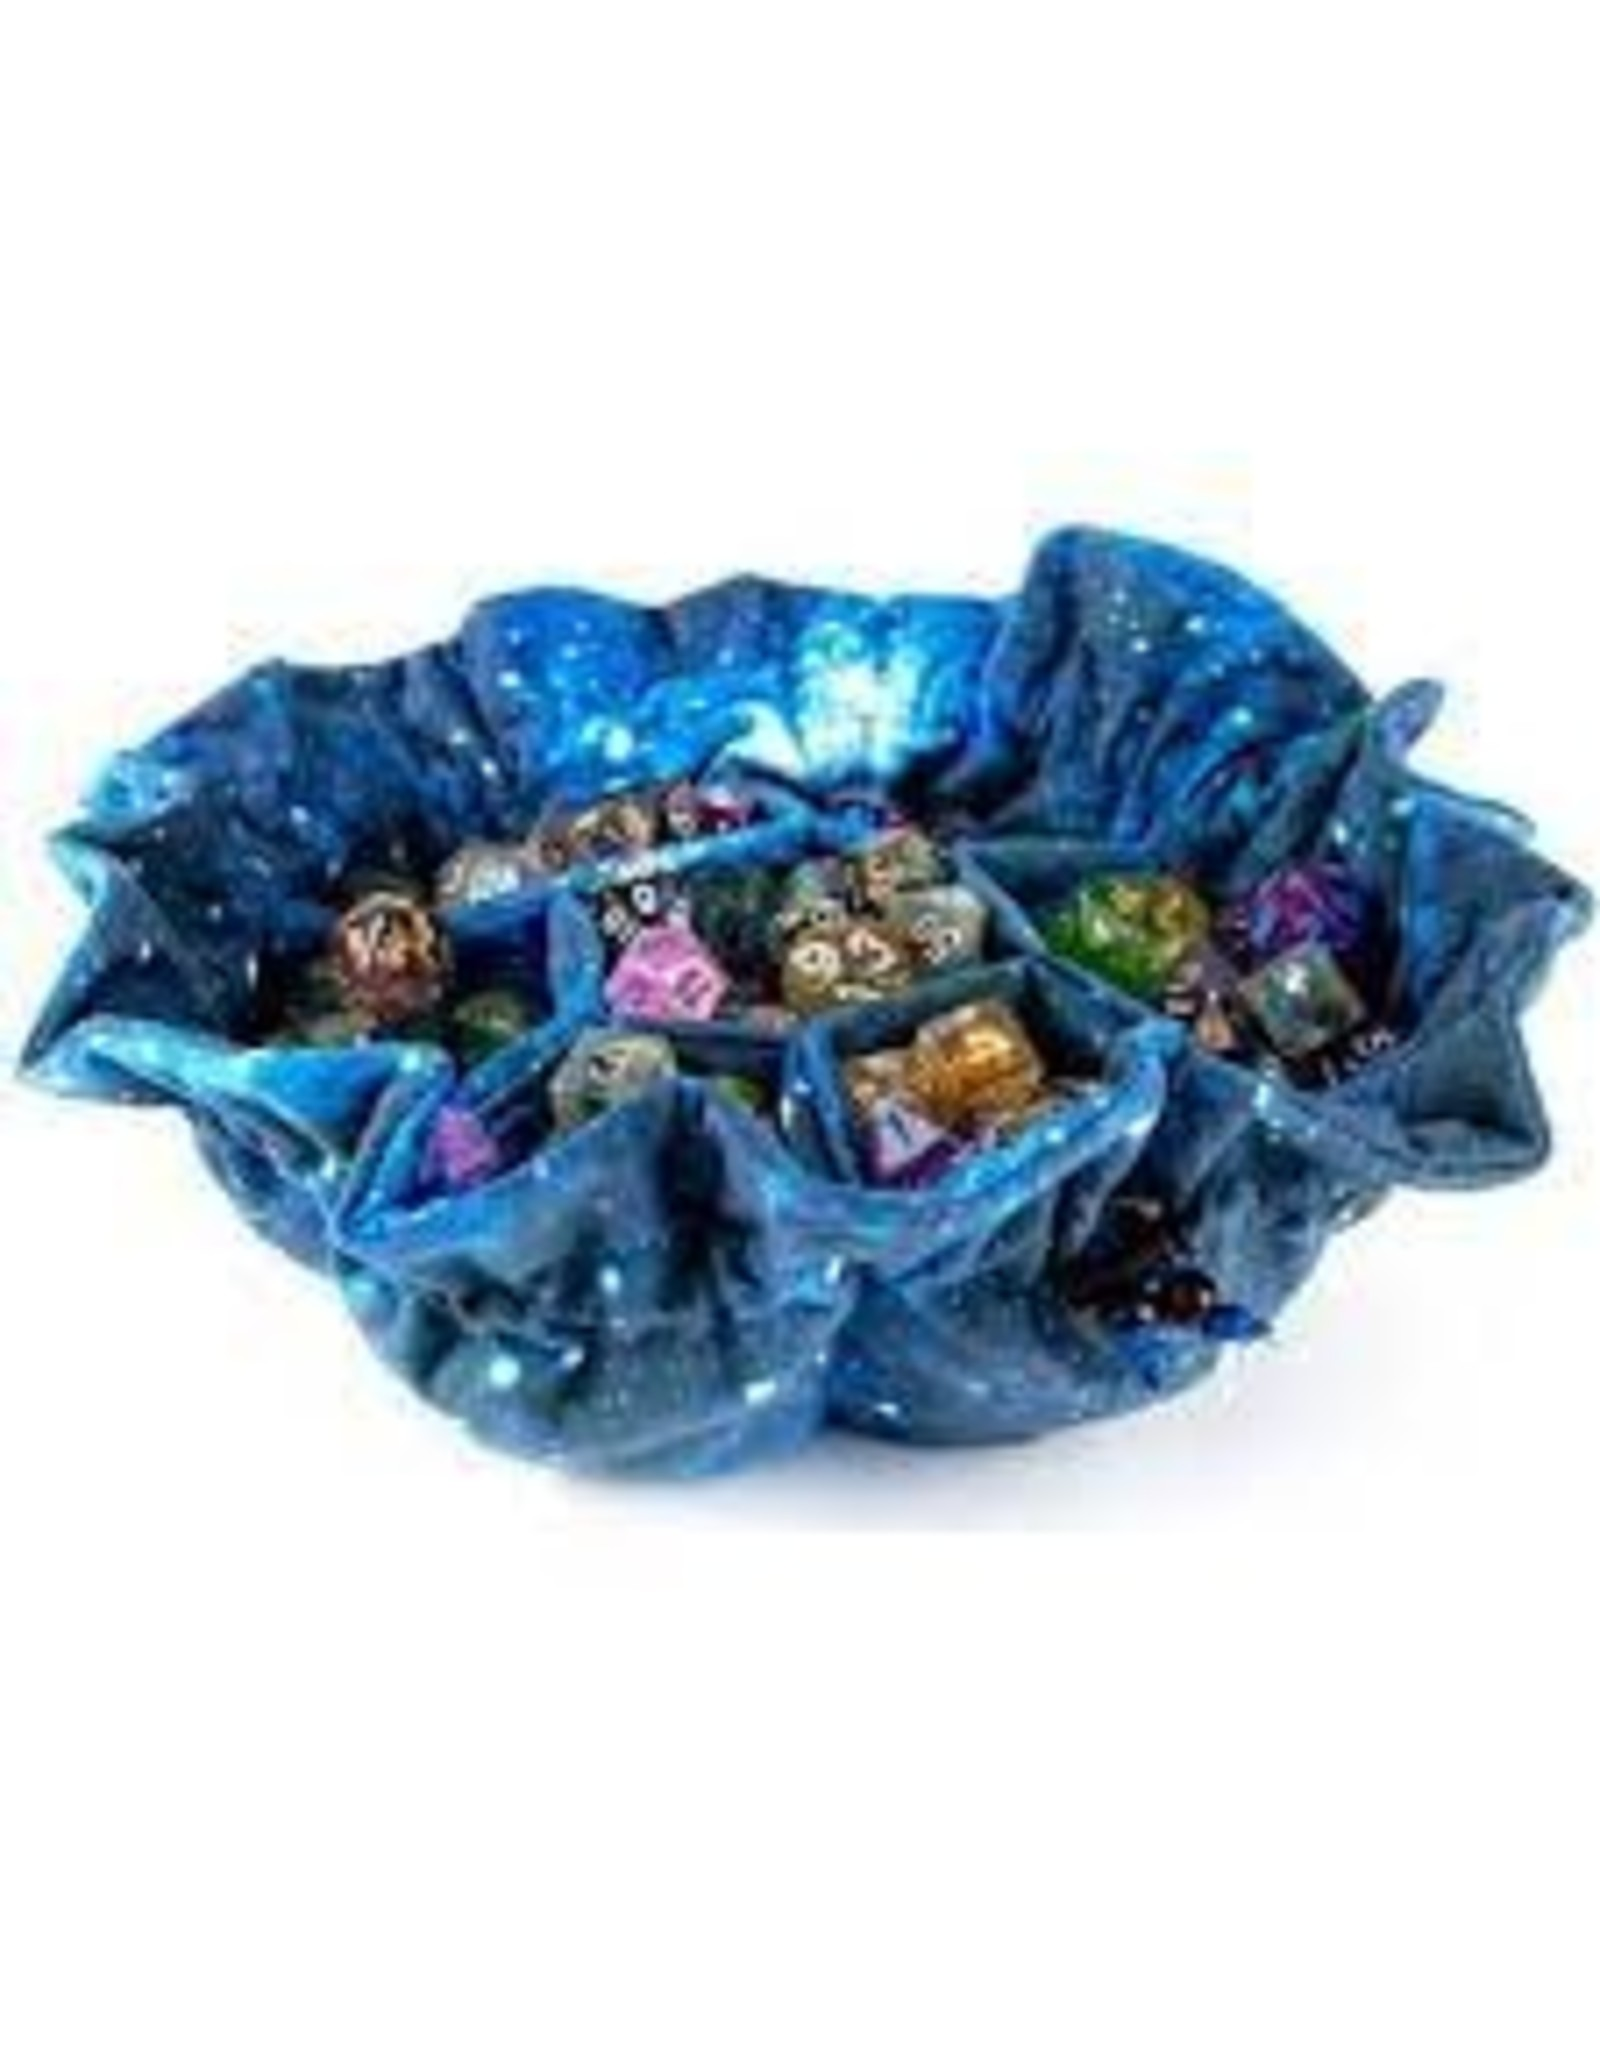 Metallic Dice Games Dice Bag with Pockets: Galaxy